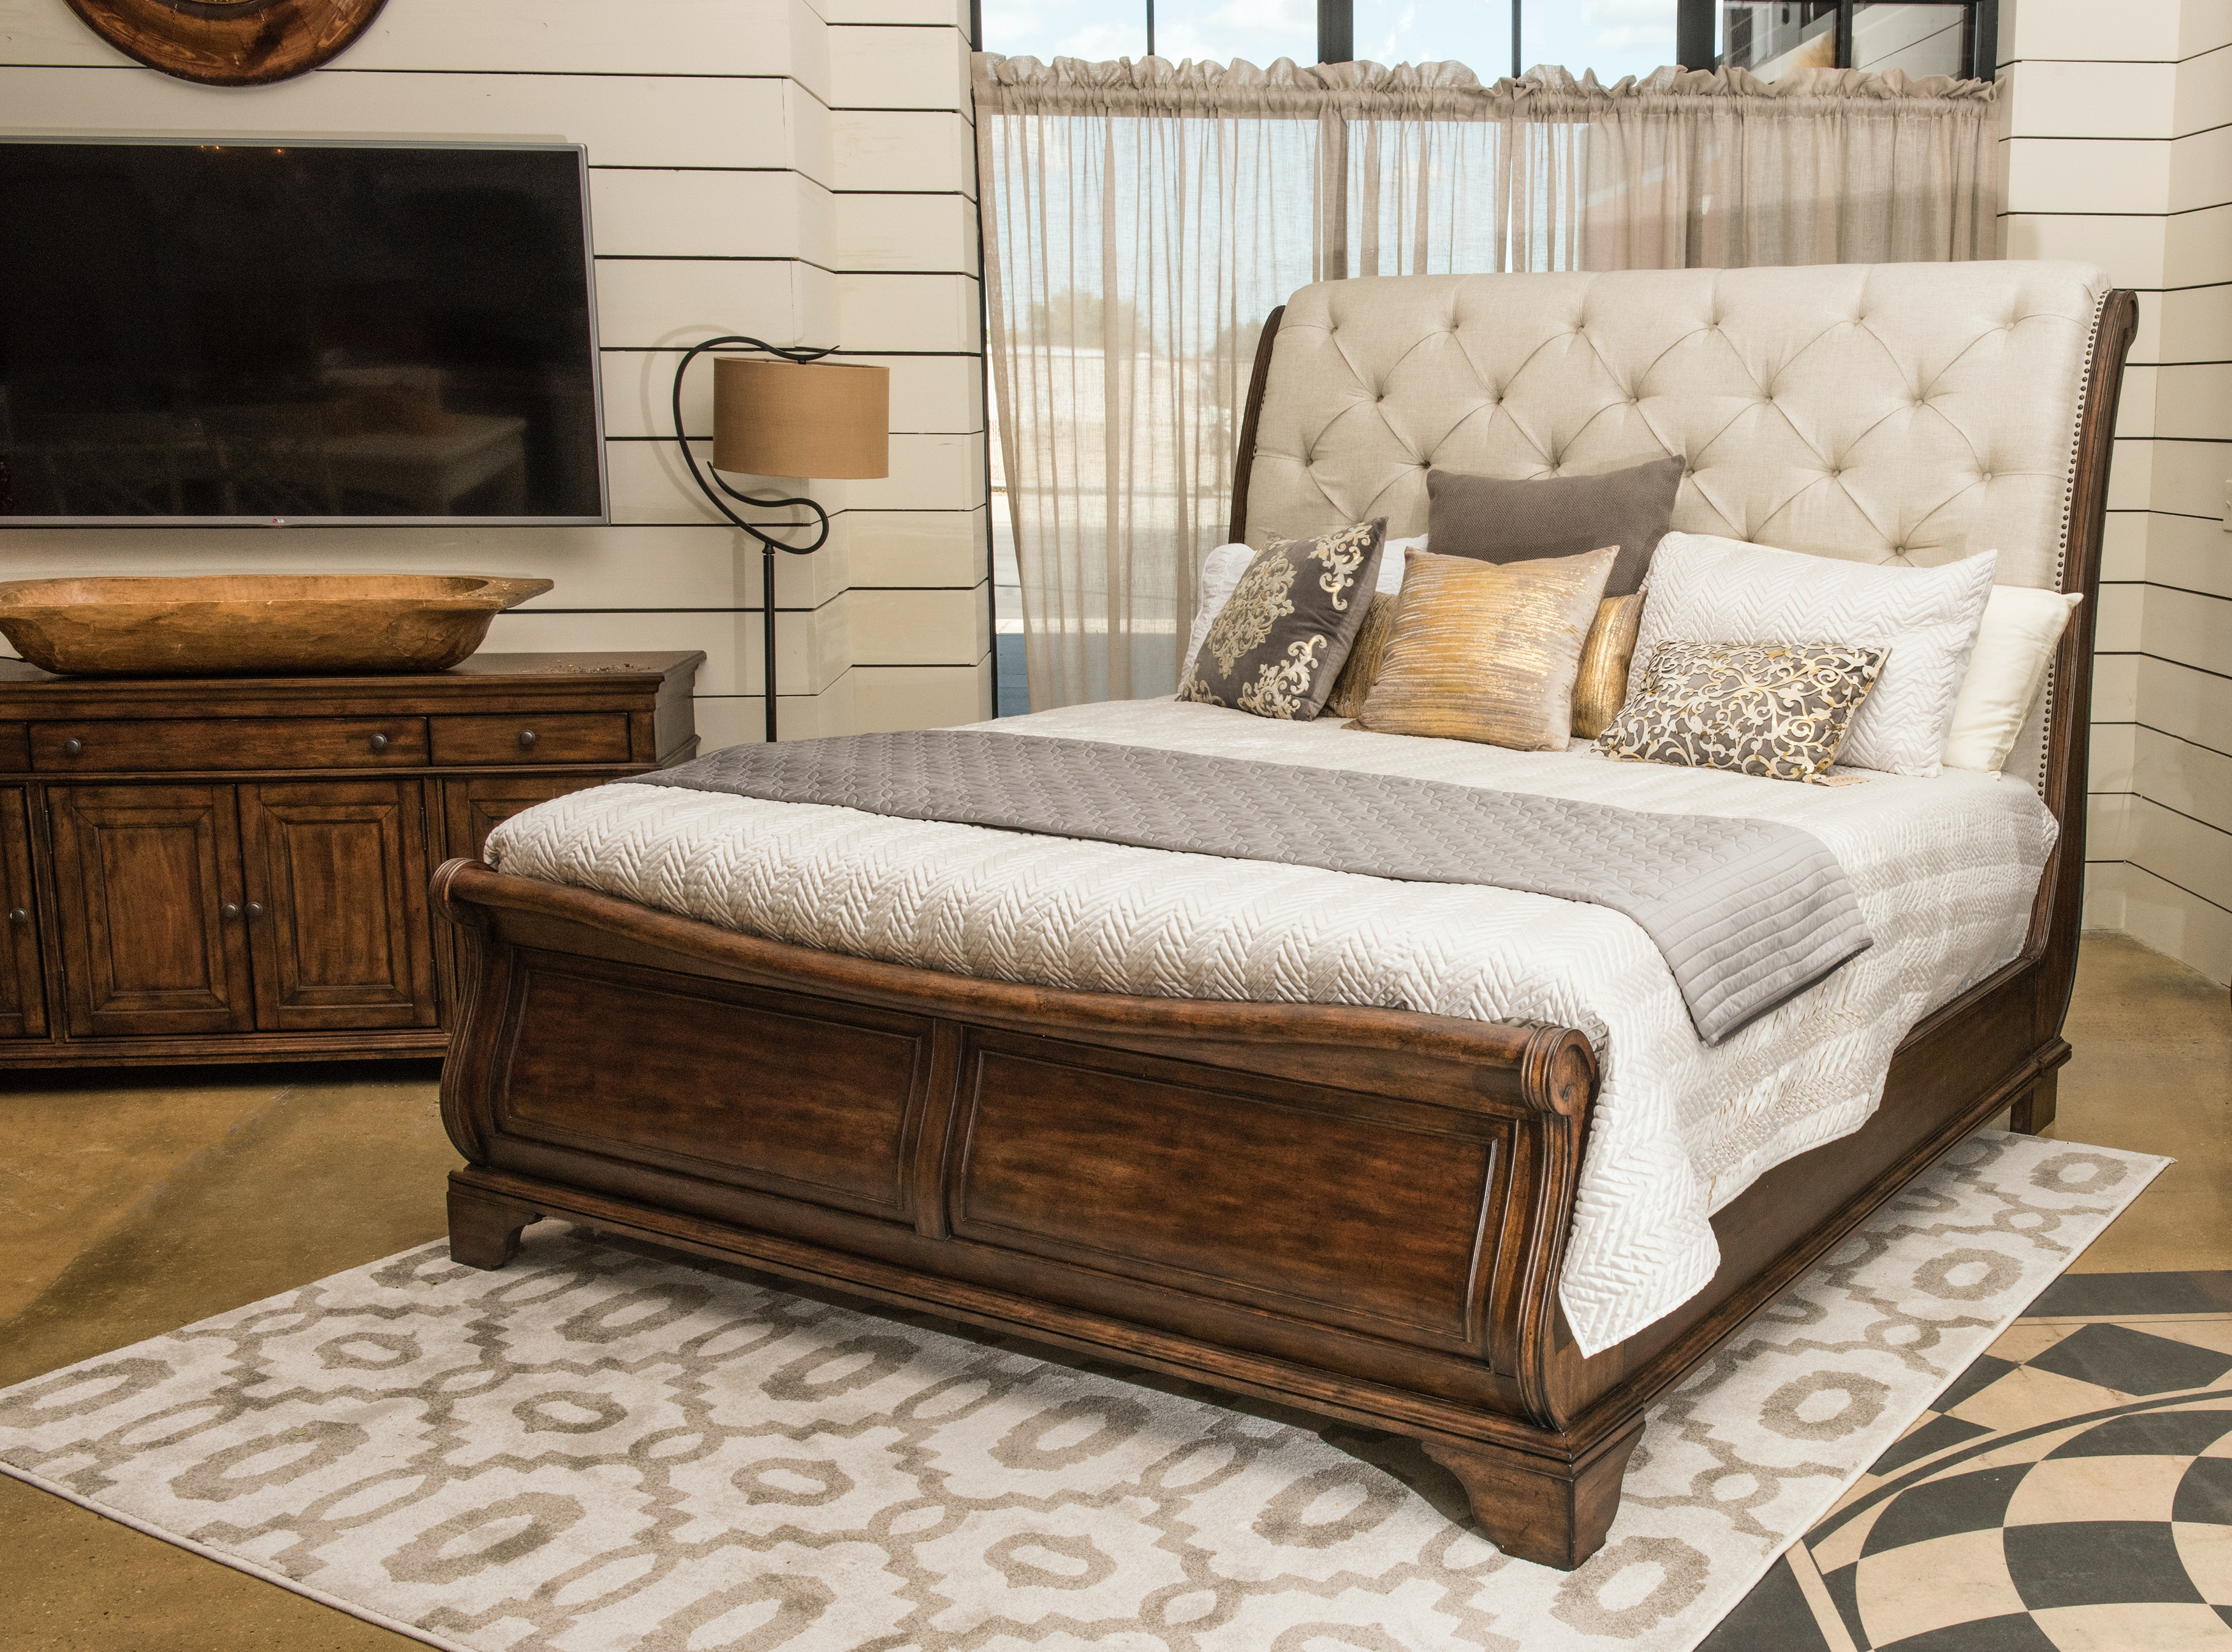 Merveilleux Trisha Yearwood Dottie Upholstered Headboard Sleigh Bed   KING KT:81885